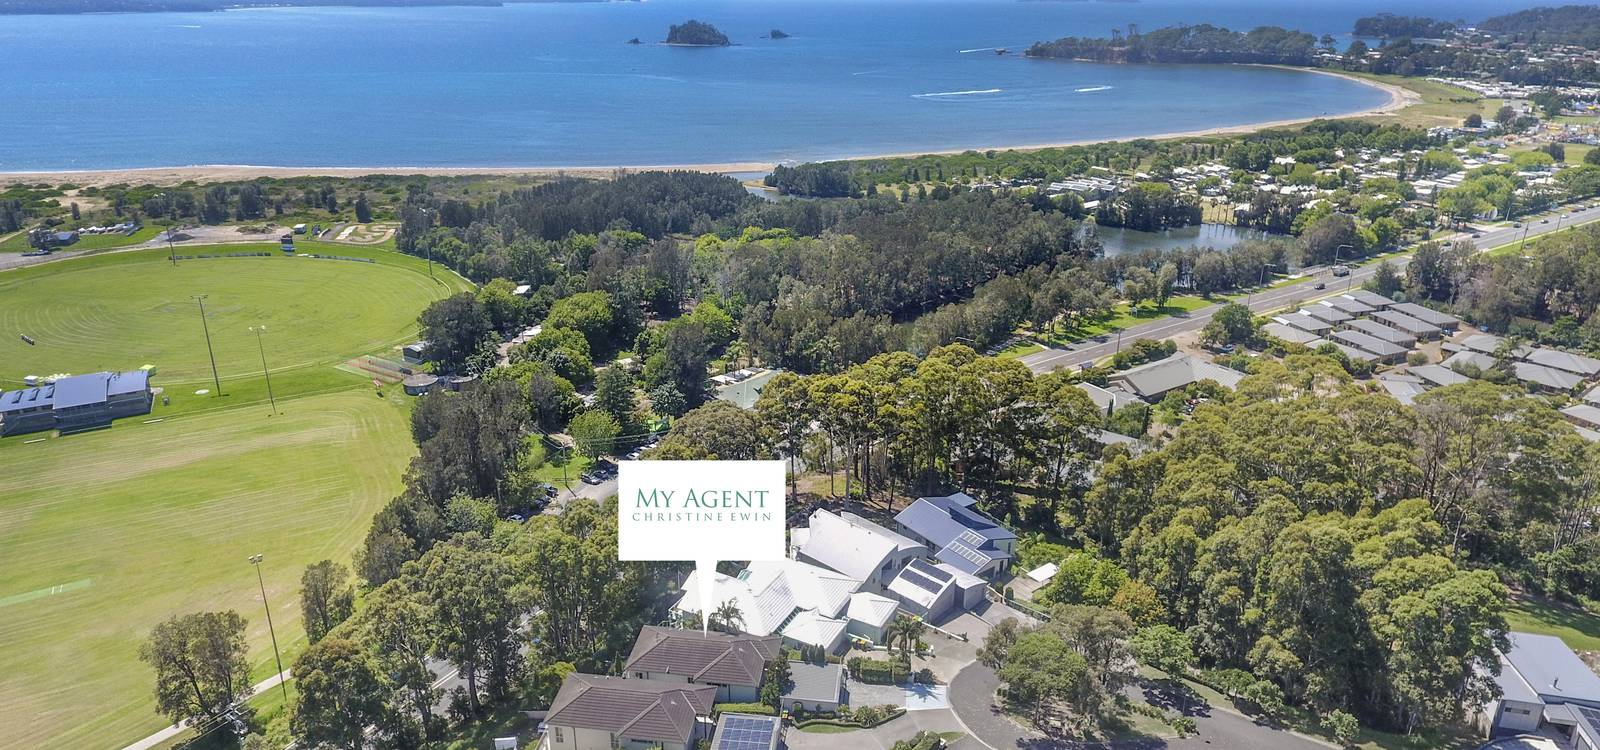 15 Sanctuary Place CATALINA, NSW 2536 - photo 1